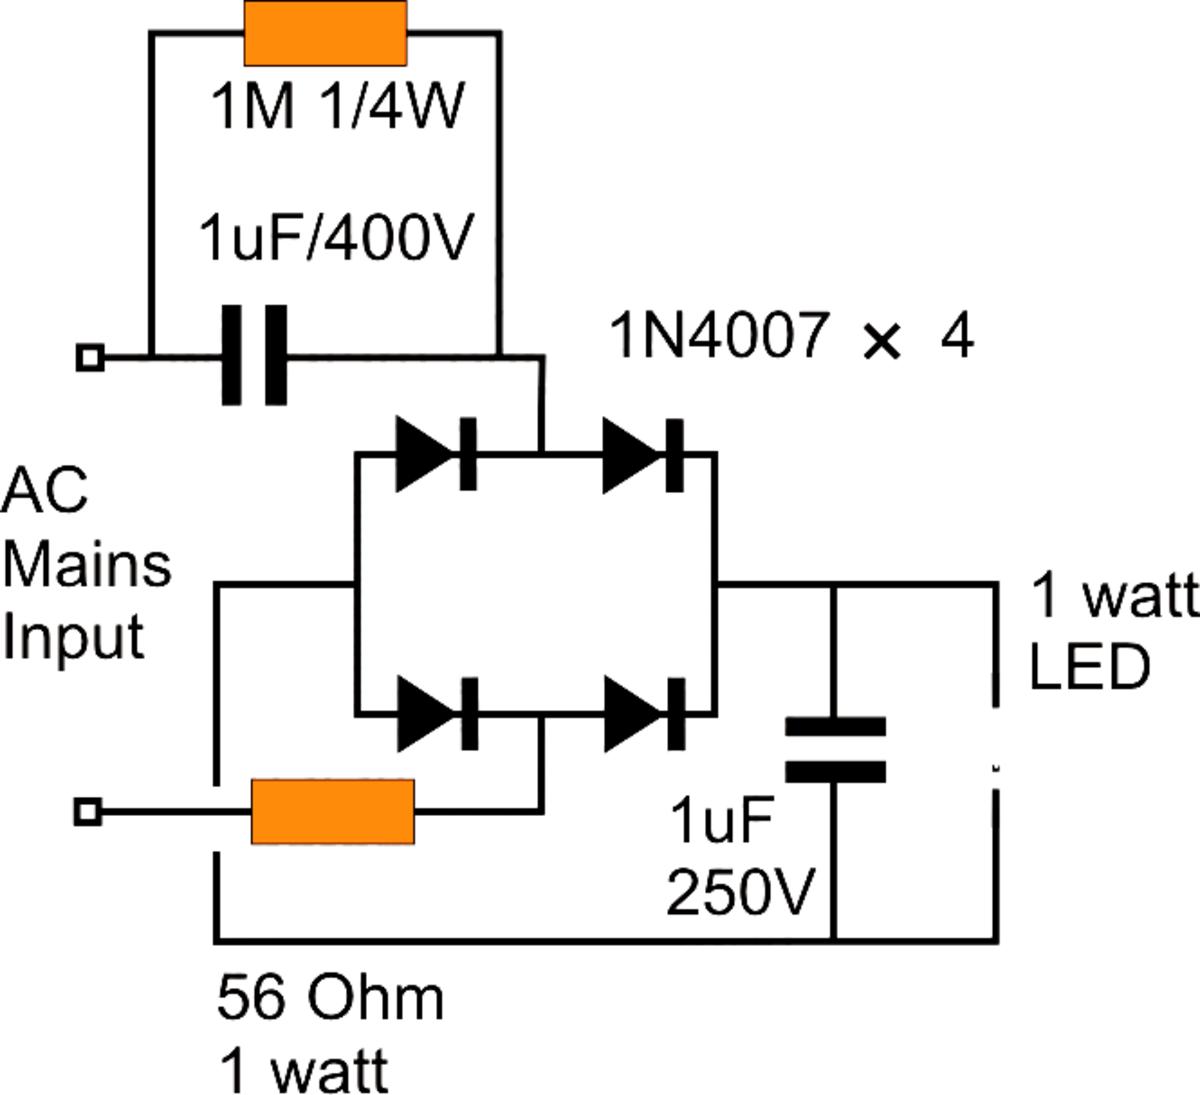 5 Watt Led Driver Circuit Diagram